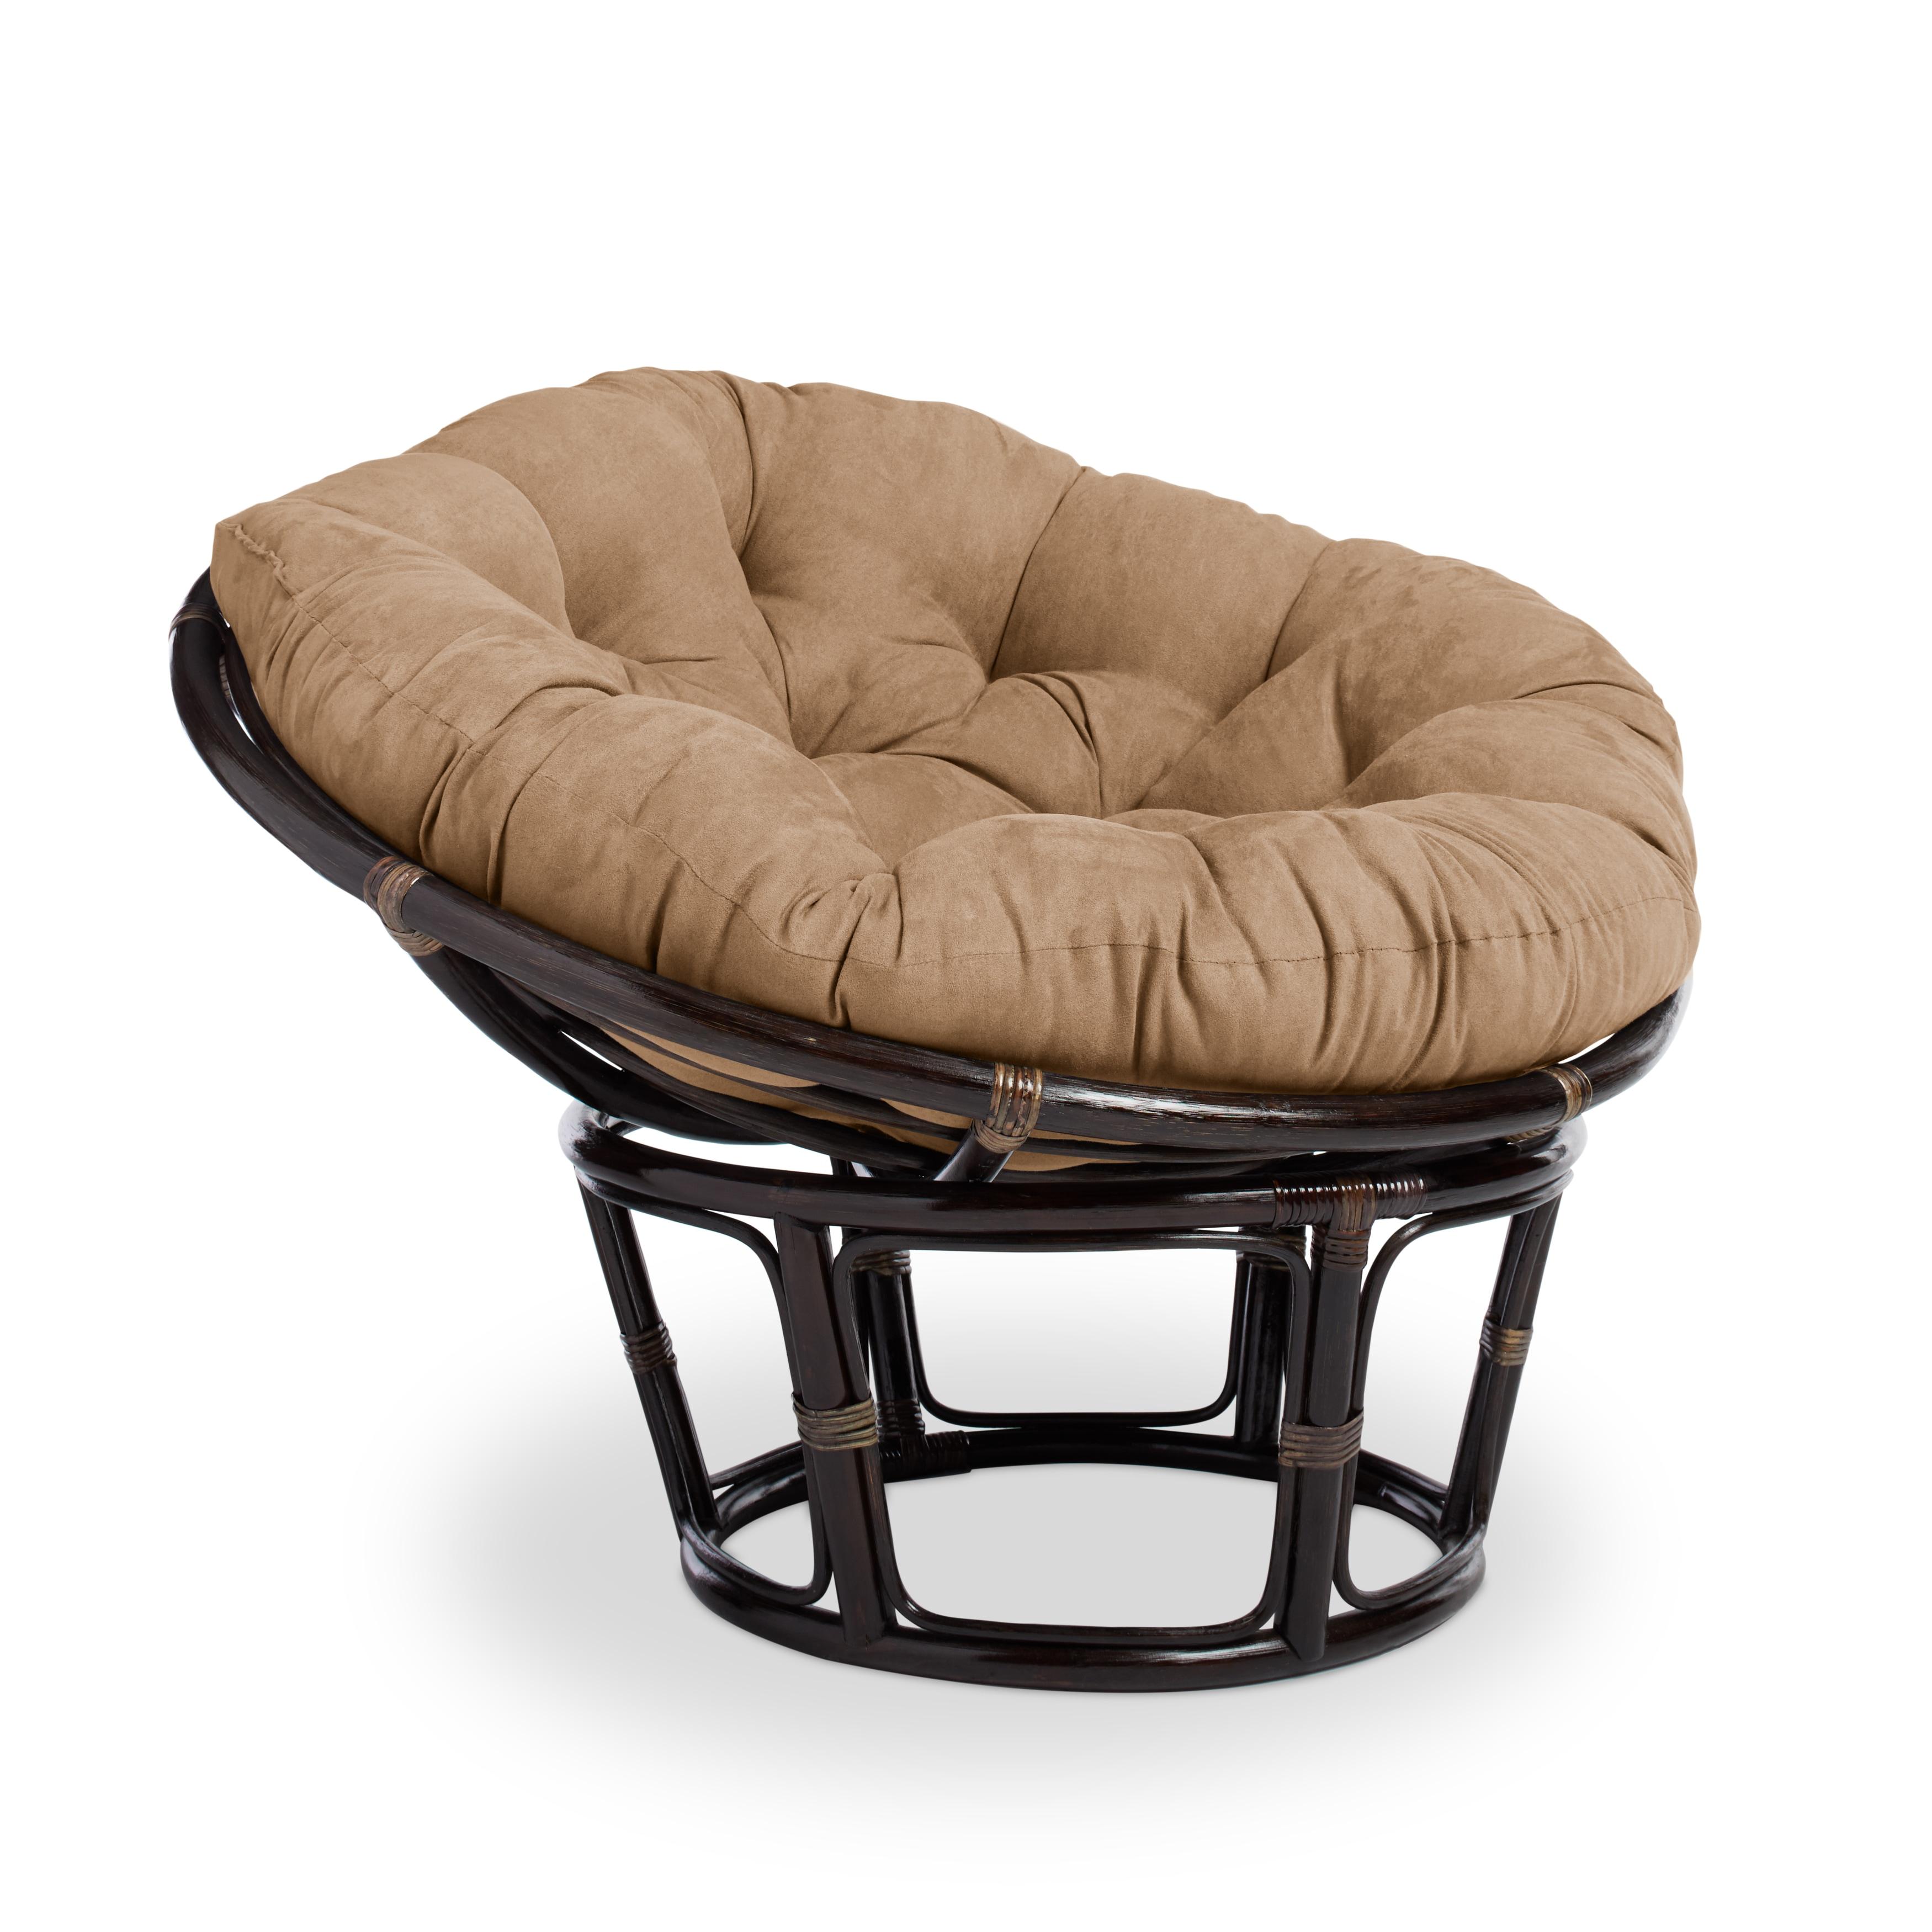 Superieur Shop International Caravan Bali 42 Inch Papasan Chair With Cushion   Free  Shipping Today   Overstock.com   7499742